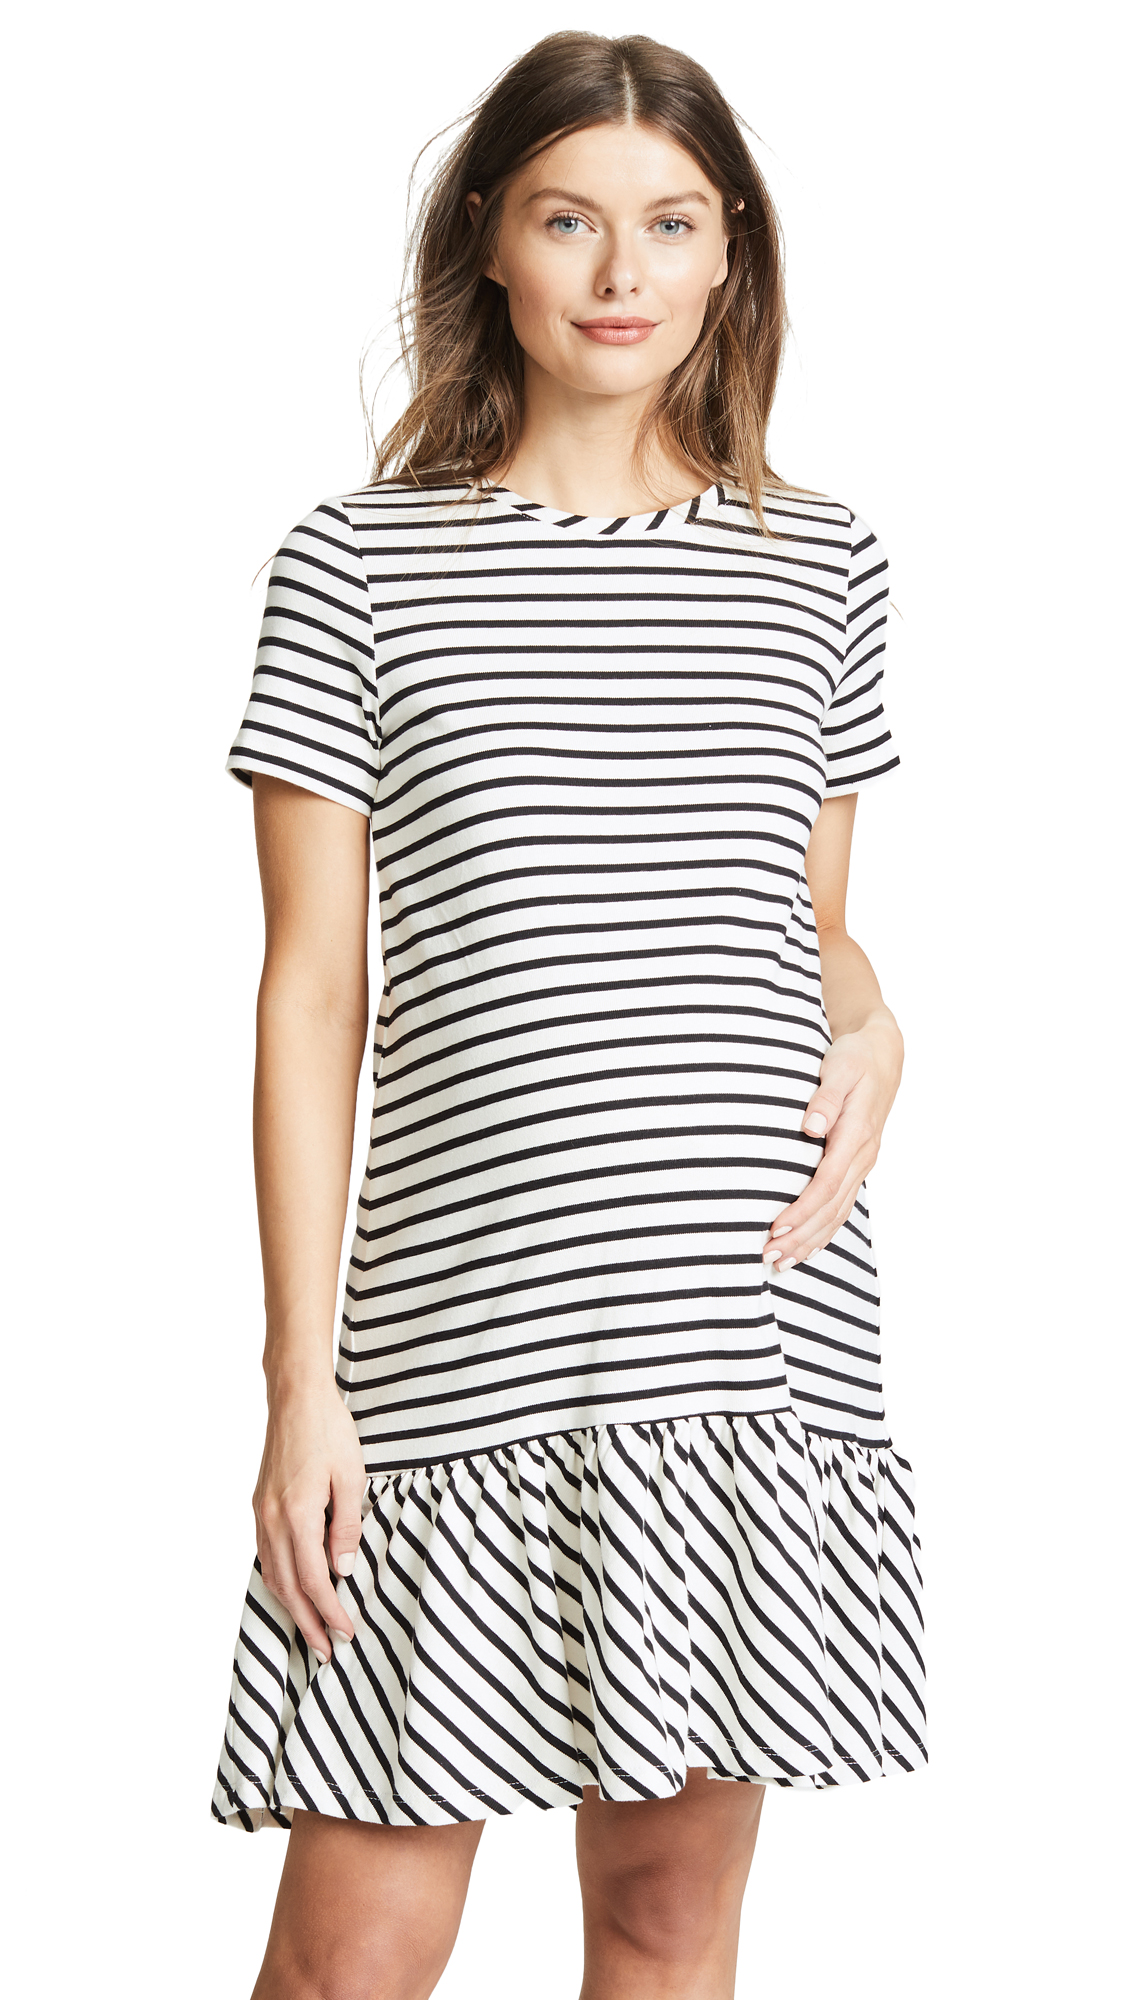 HATCH The Harbour Dress In Black White Stripe